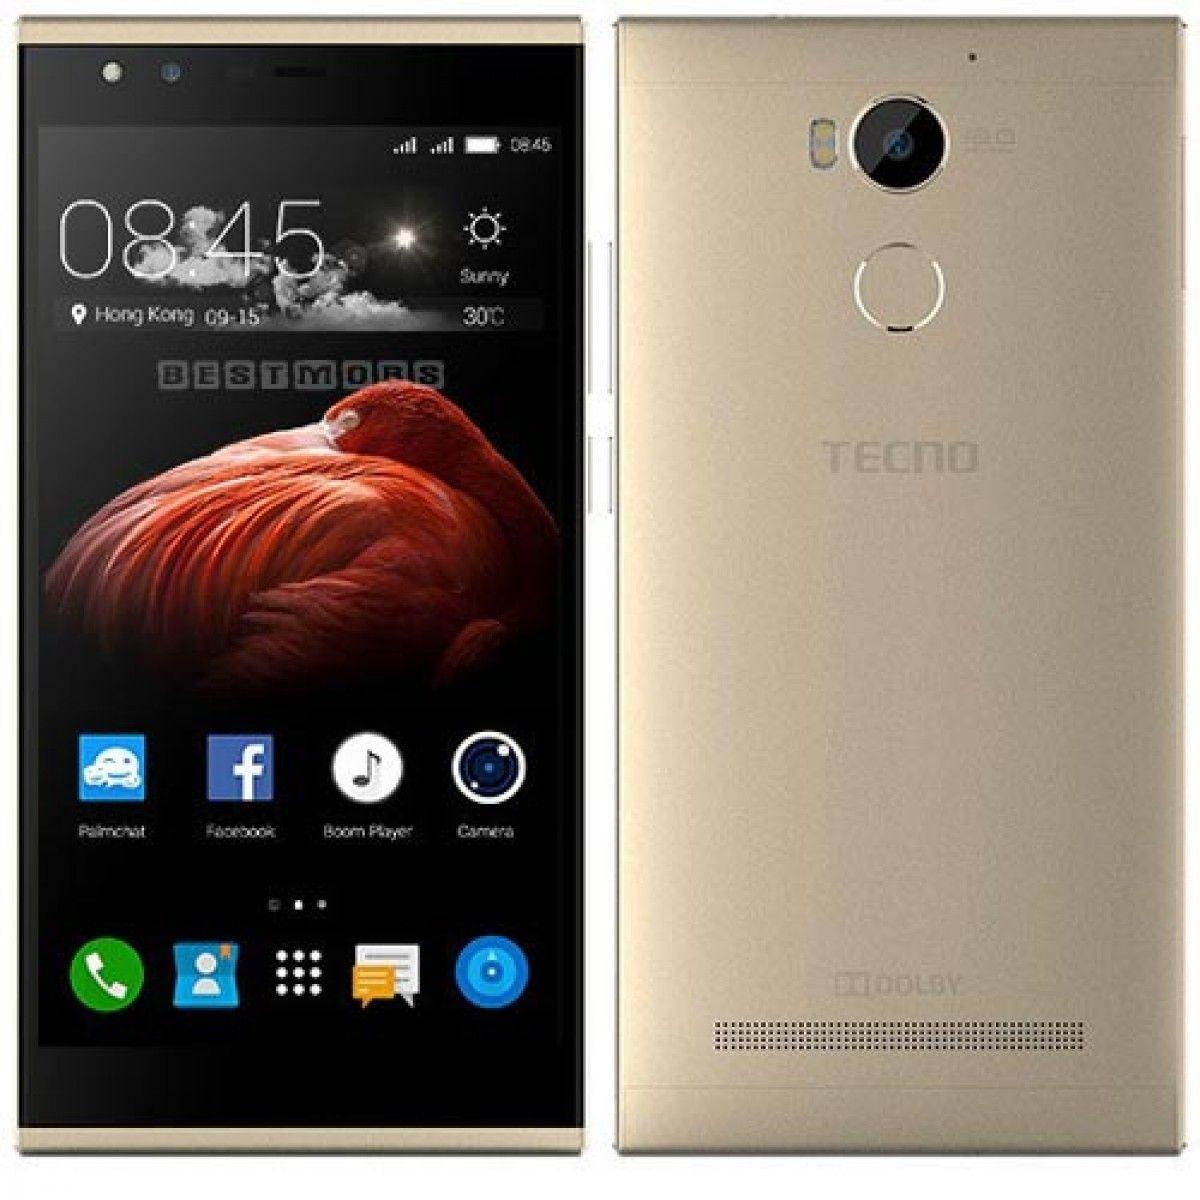 Nokia xl price nigeria - Tecno Phantom 5 Price Specs In Nigeria